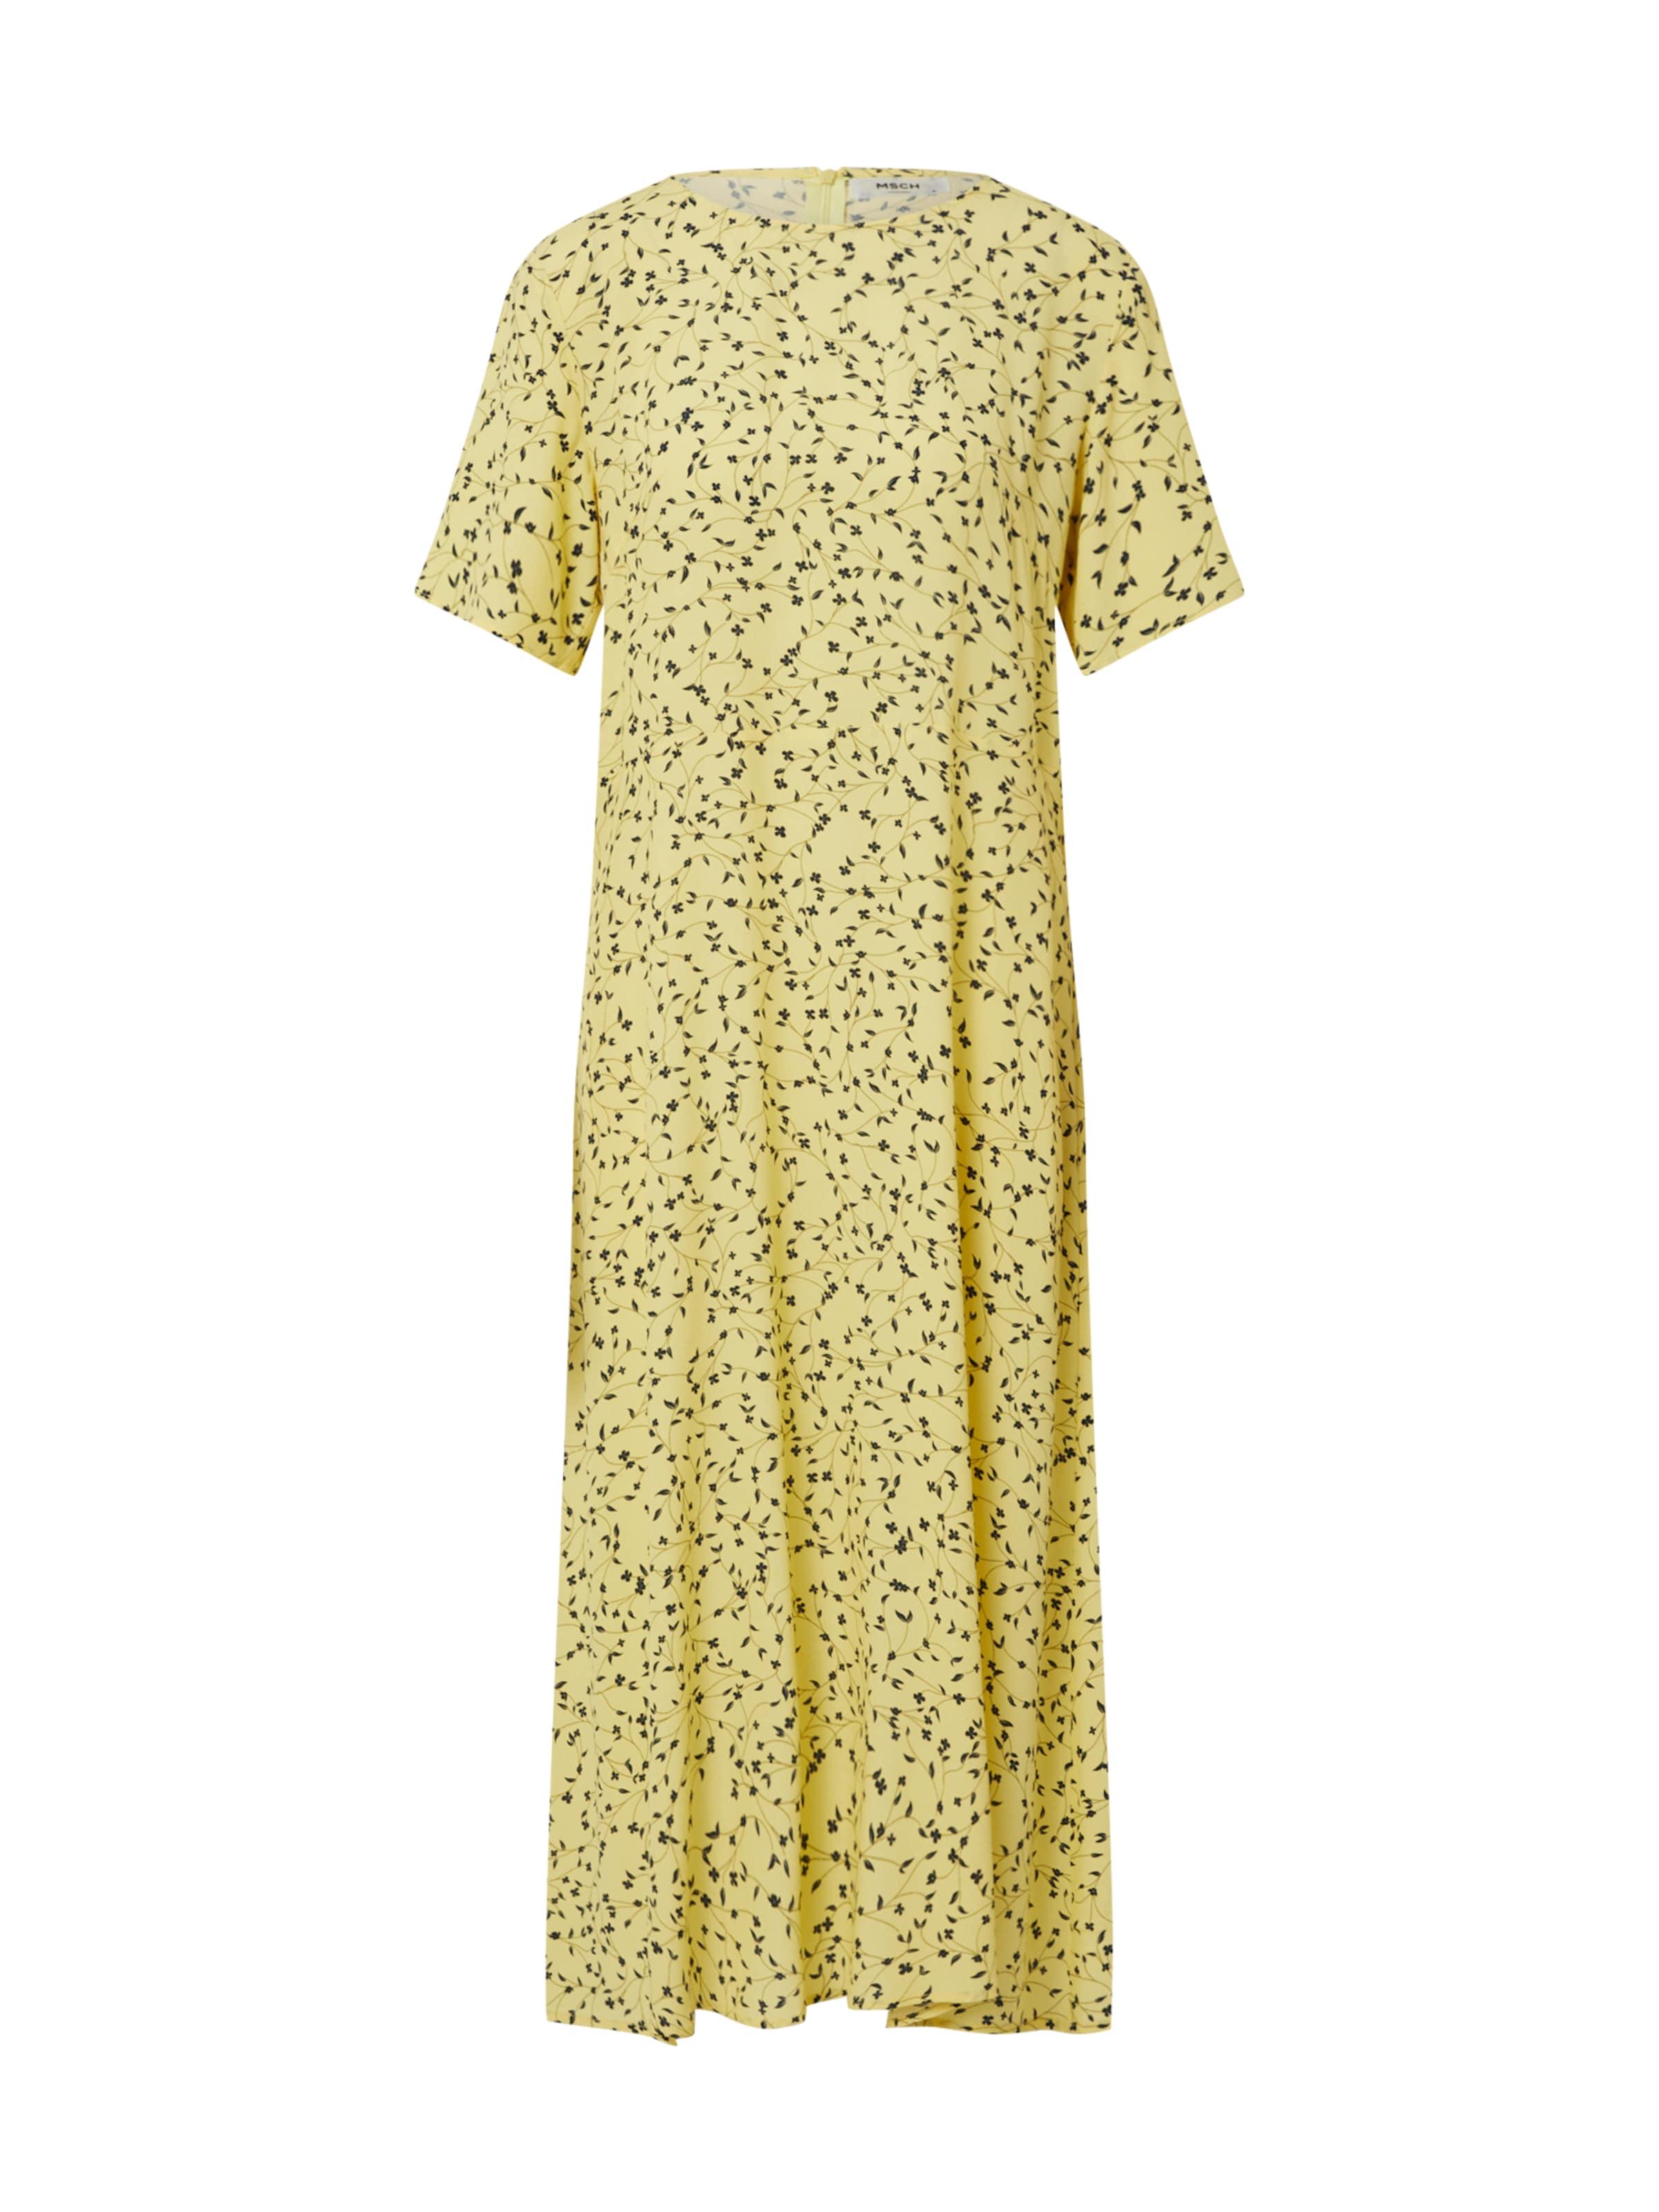 MOSS COPENHAGEN Kleid 'Jillian' in gelb / weiß